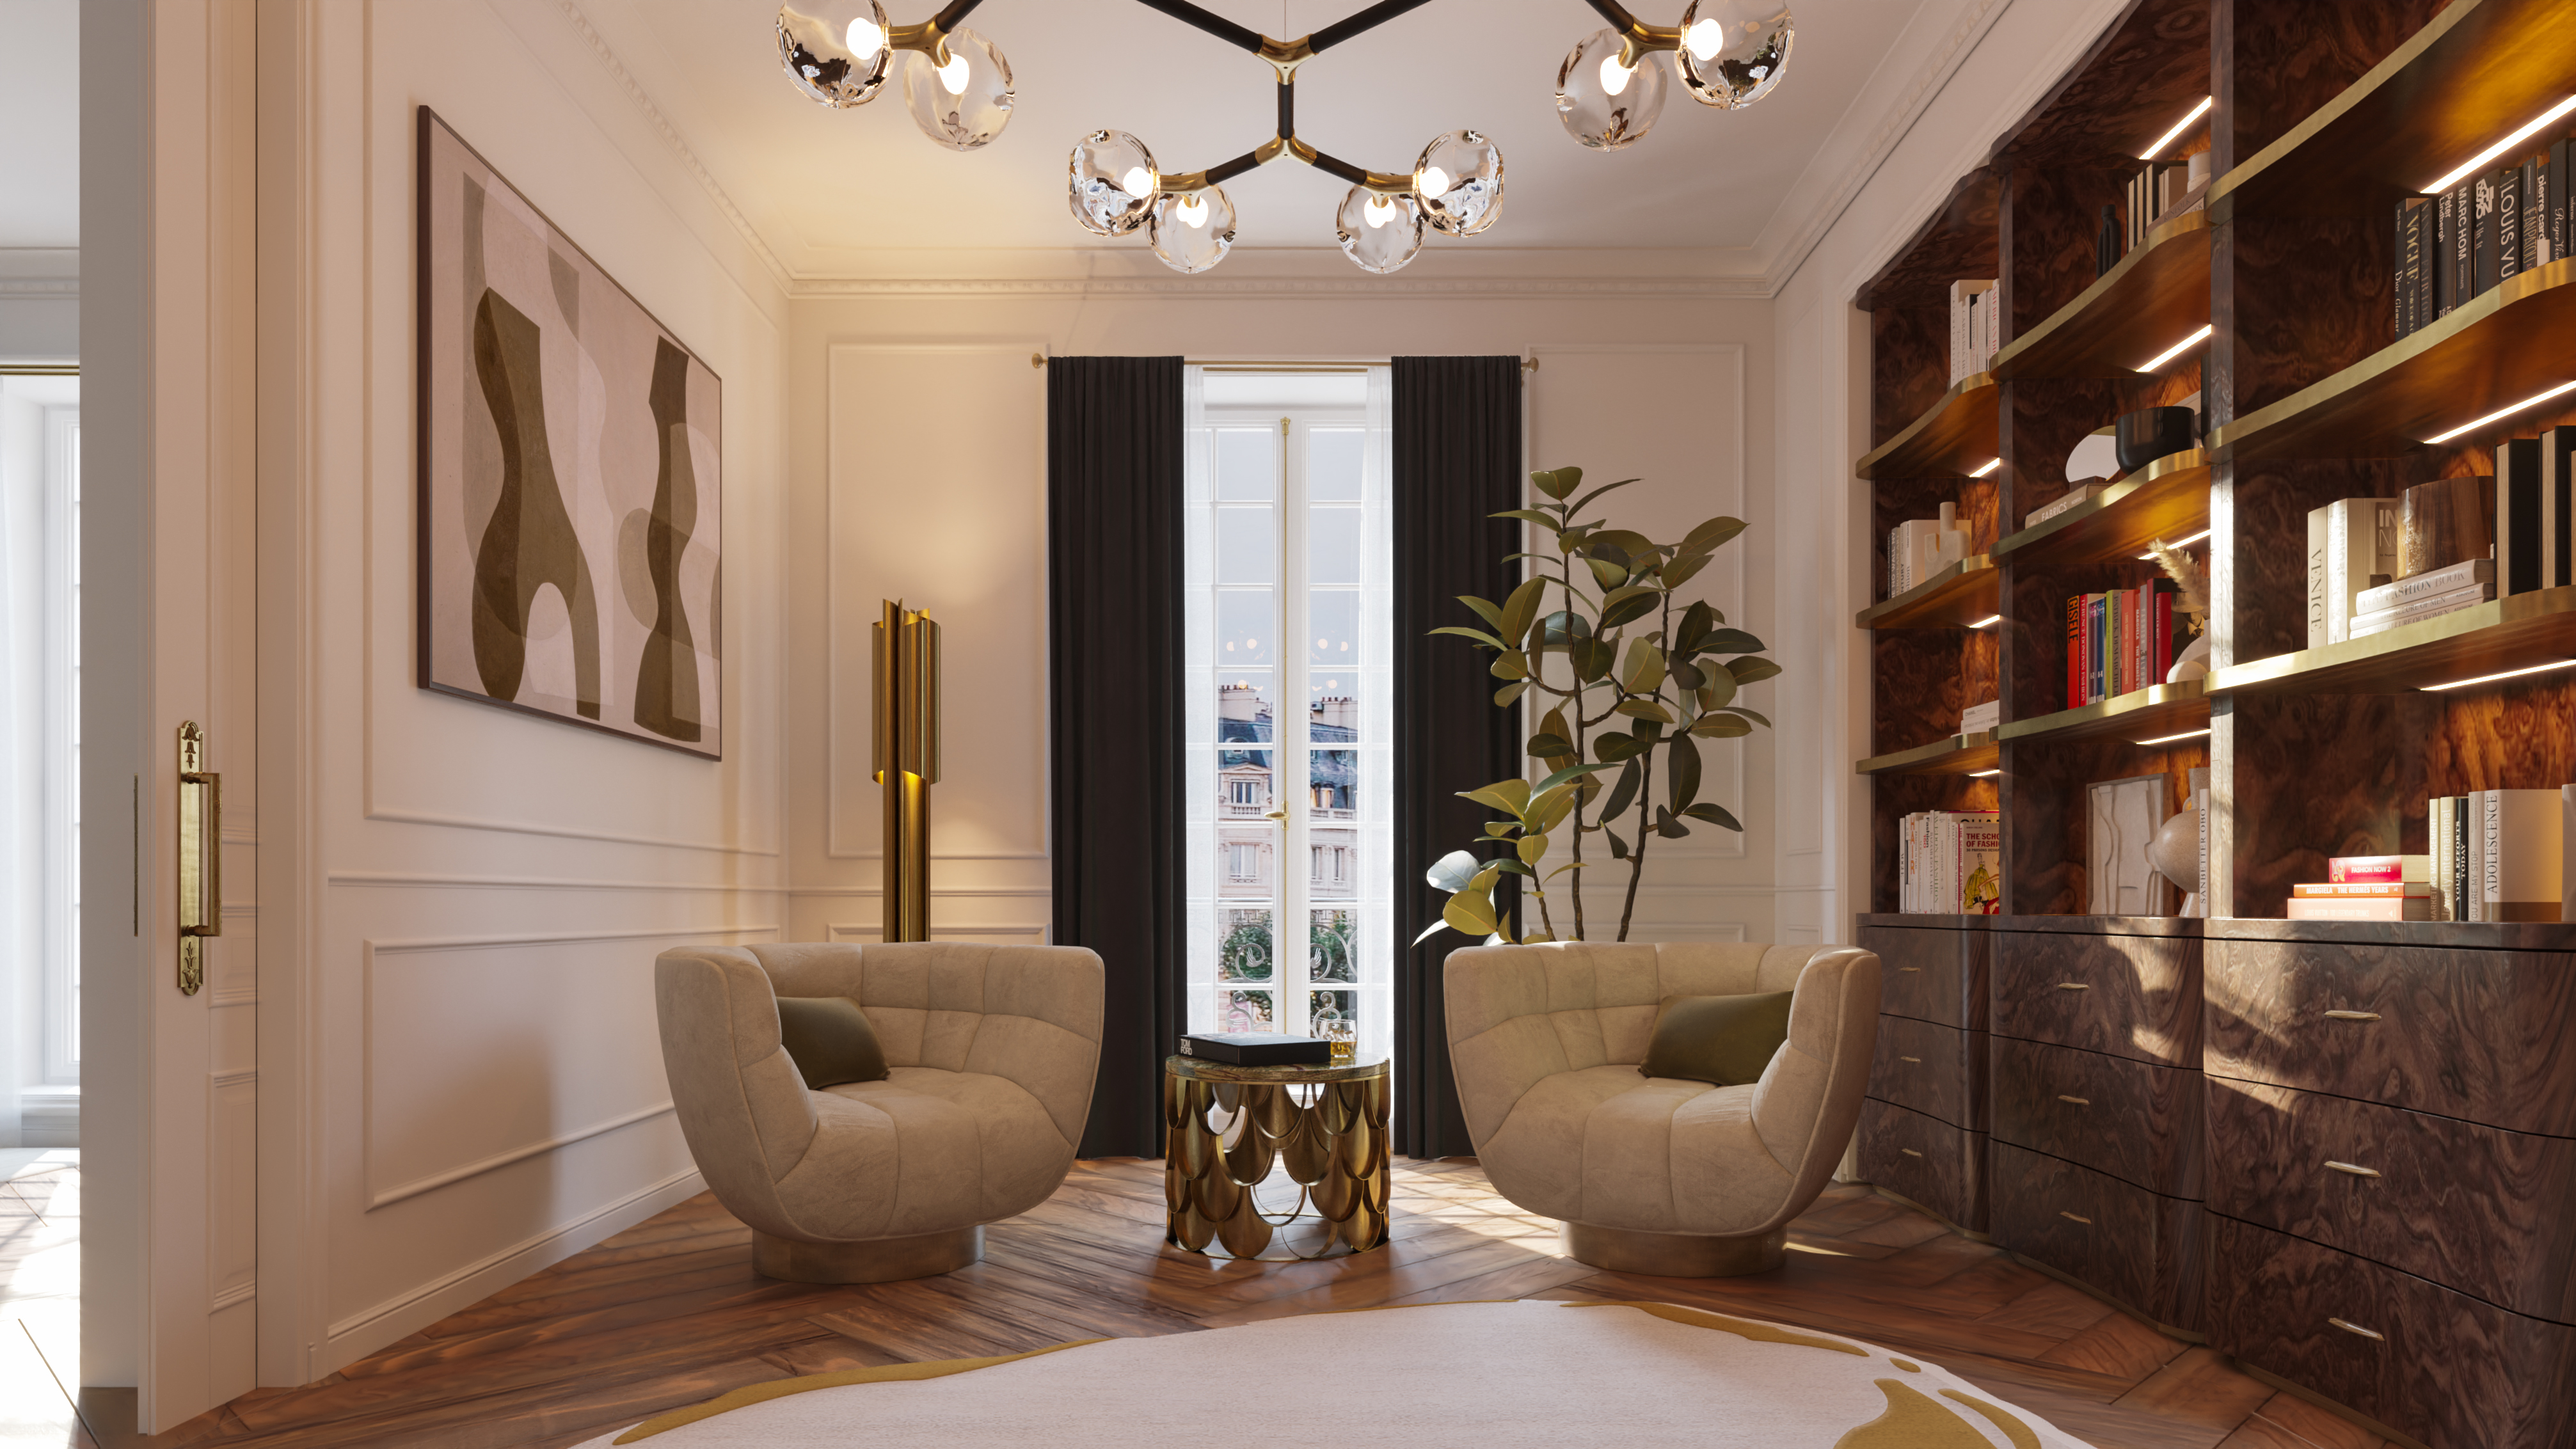 The Eternel Parisian Apartment: A Unique and Inspiring Project  Parisian Apartment The Eternel Parisian Apartment: A Unique and Inspiring Project Home Society Paris House Office